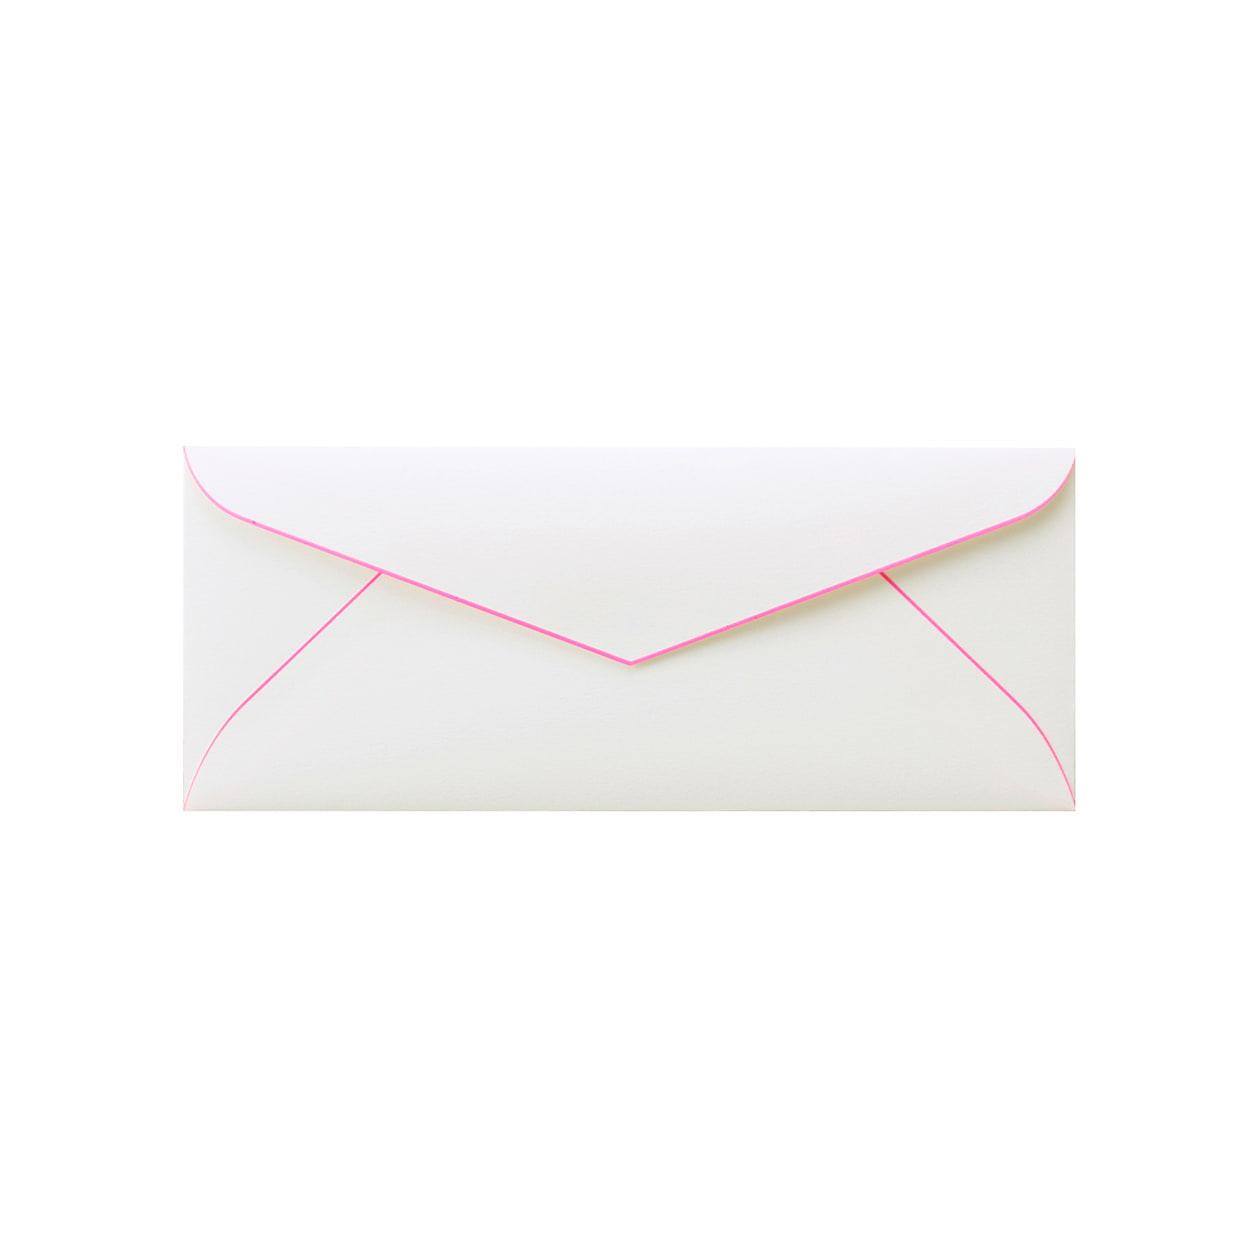 DLSダイア封筒 コットン スノーホワイトBD蛍光ピンク 116.3g